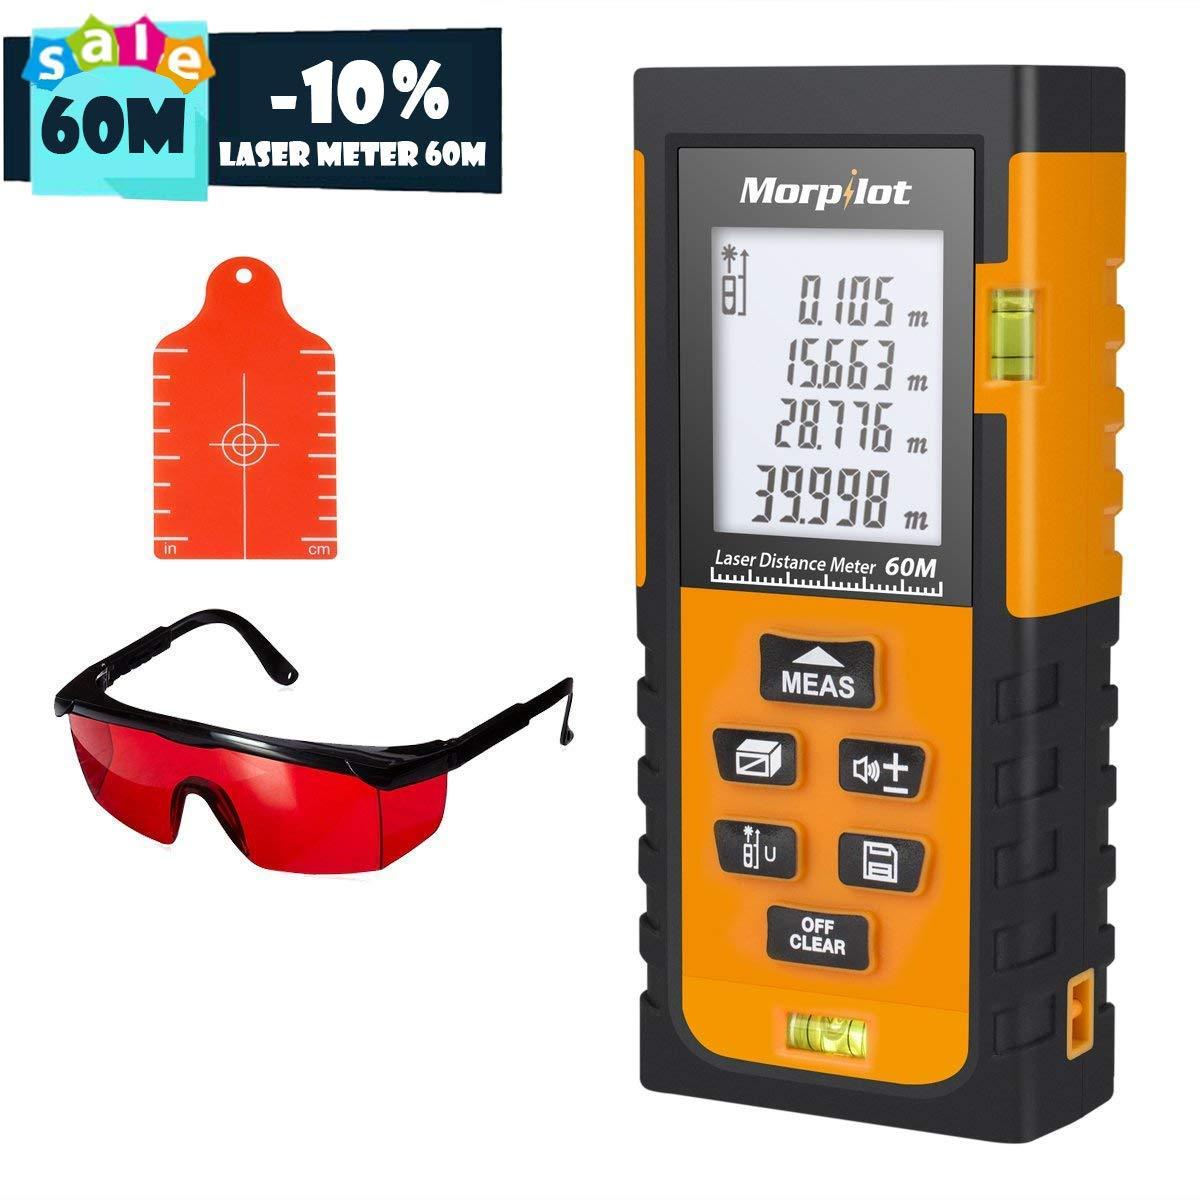 Laser Measuring Tape,Morpilot 80M Laser Measure with Target Plate & Enhancing Glasses,Laser Measure Device with Pythagorean Mode, Measure Distance, Area, Volume Calculation - Black & Orange HM80